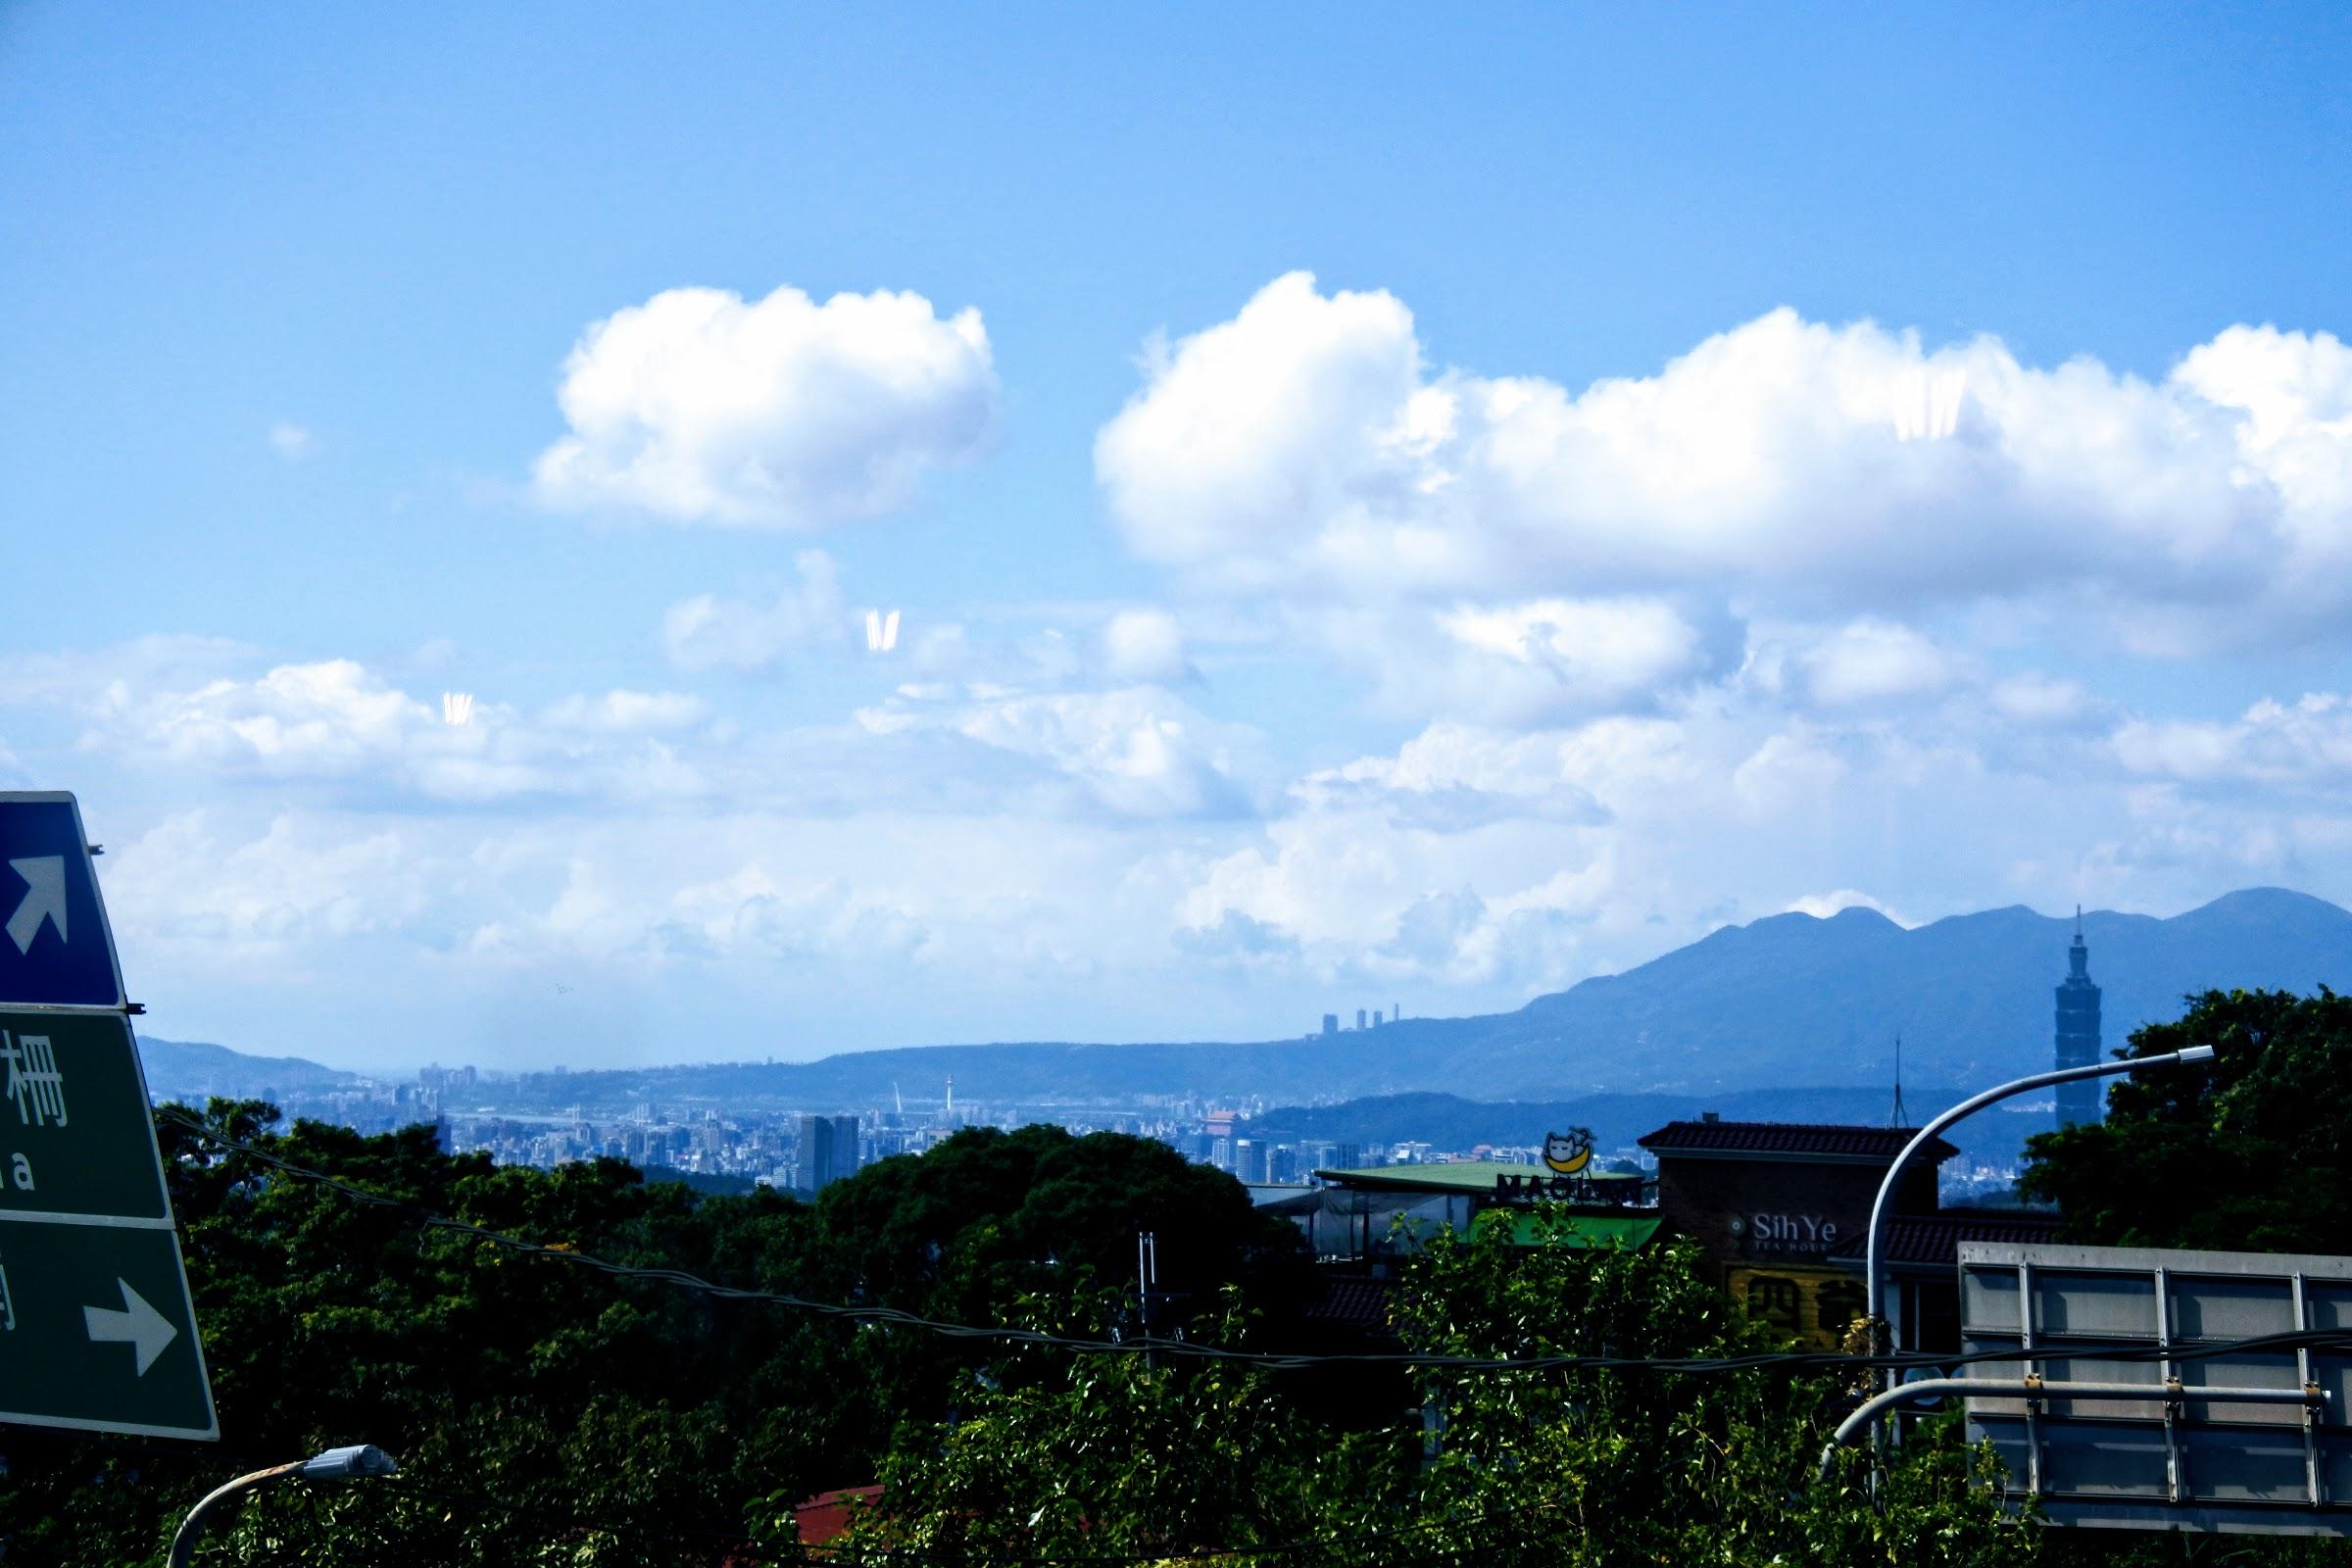 Taipei 101 from afar